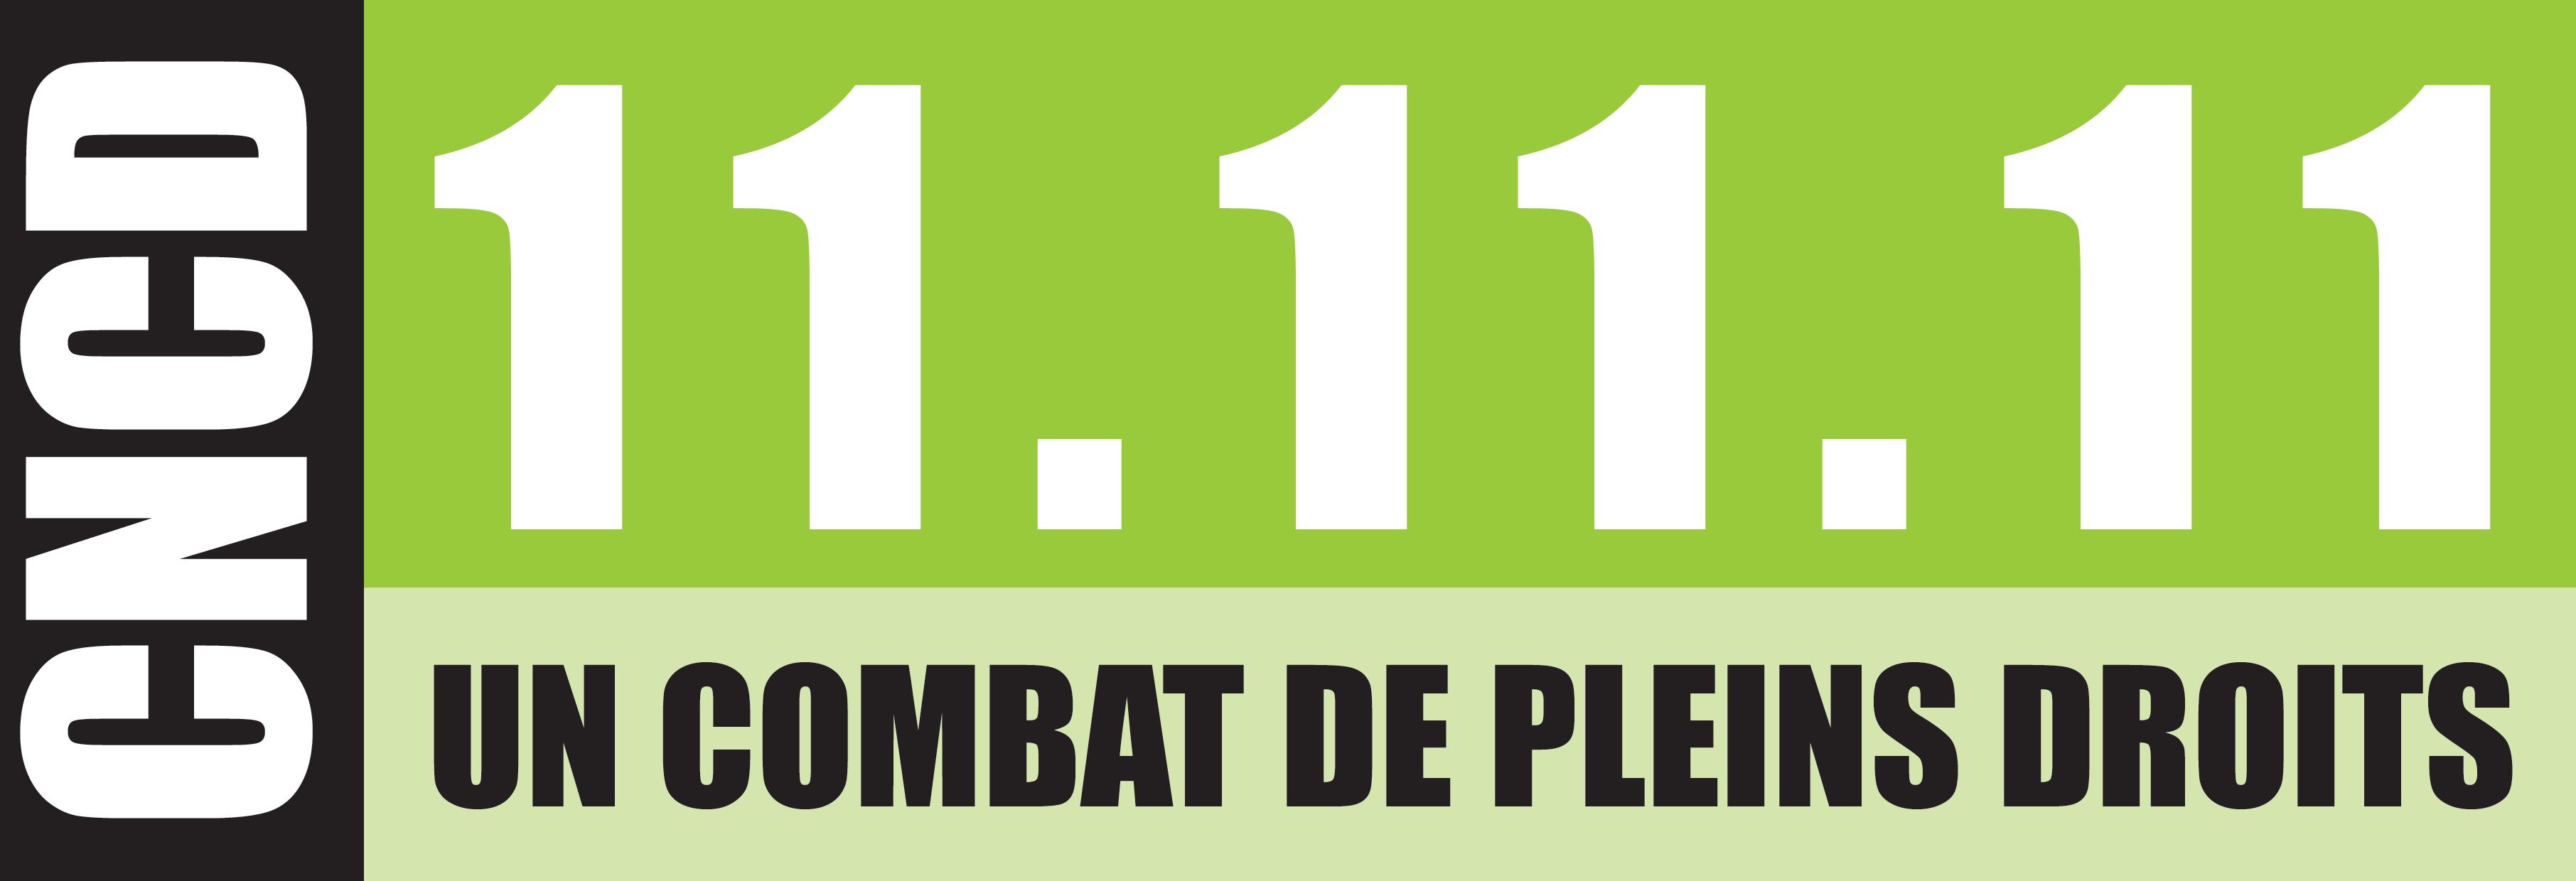 Logo de CNCD 11-11-11